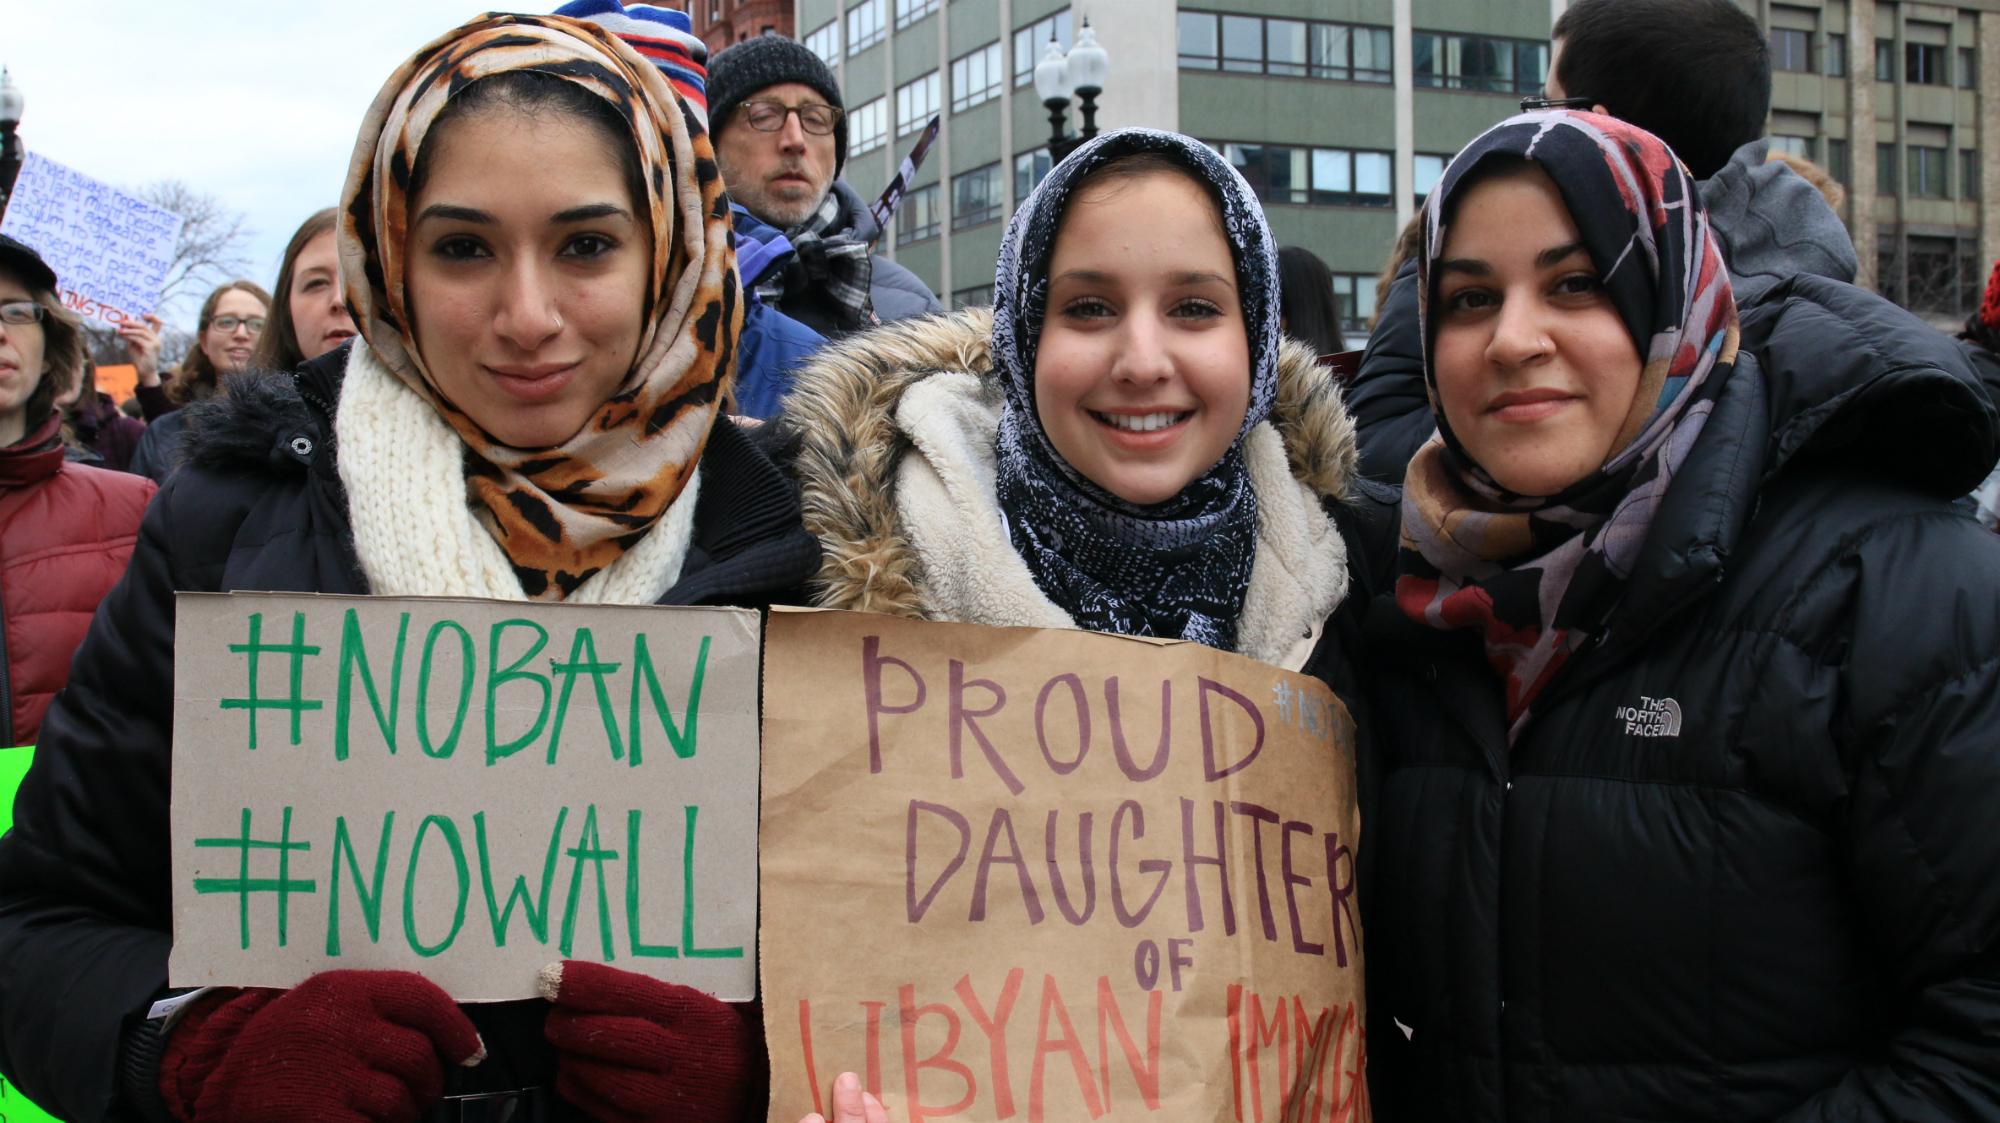 Jasmin Riad (left), Noor Traina and Zara Majidi protested against President Donald Trump's executive order in Boston's Copley Square on Jan. 29, 2017. (Photo by Giulia Afiune/GroundTruth)